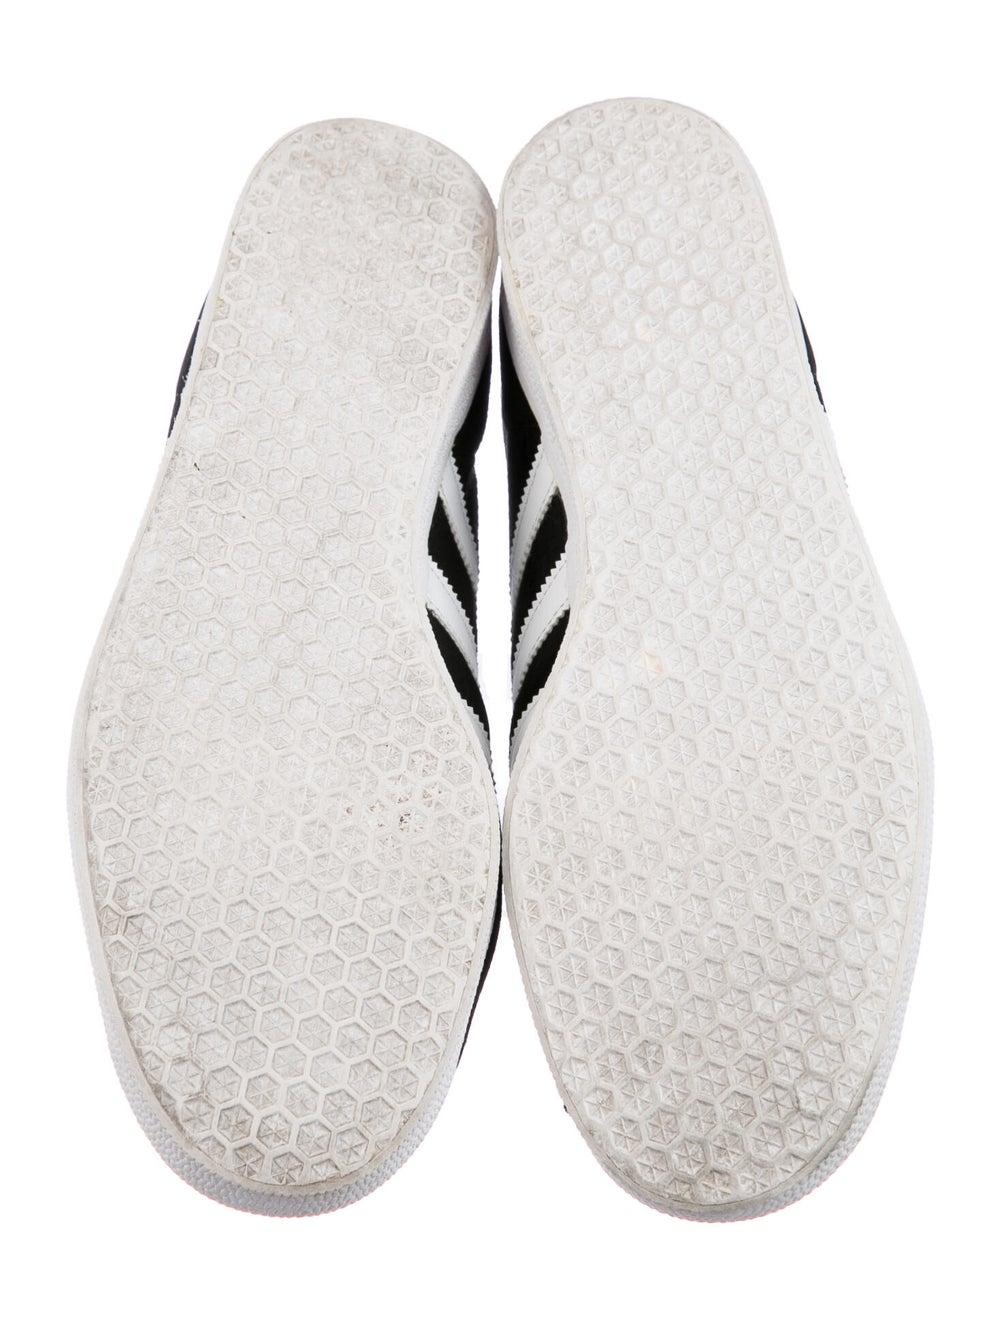 Adidas Gazelle Sneakers Black - image 5